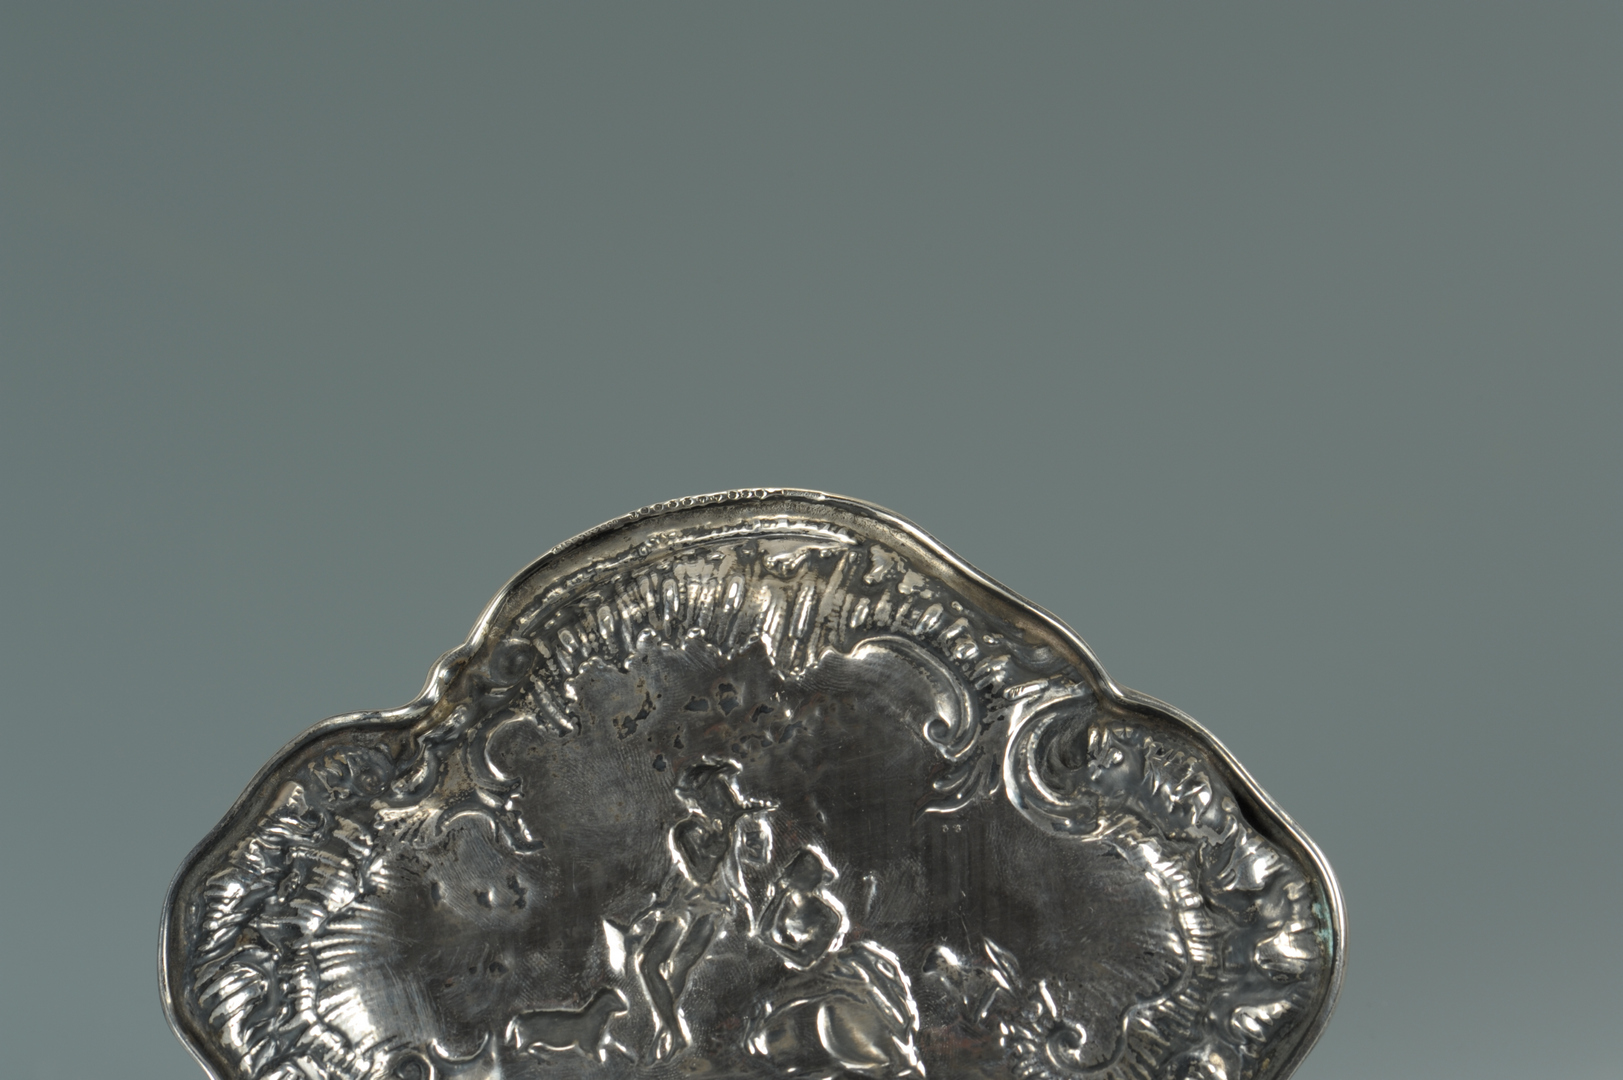 Lot 58: Tiffany and Co. Rococo Style Silver Card Tray